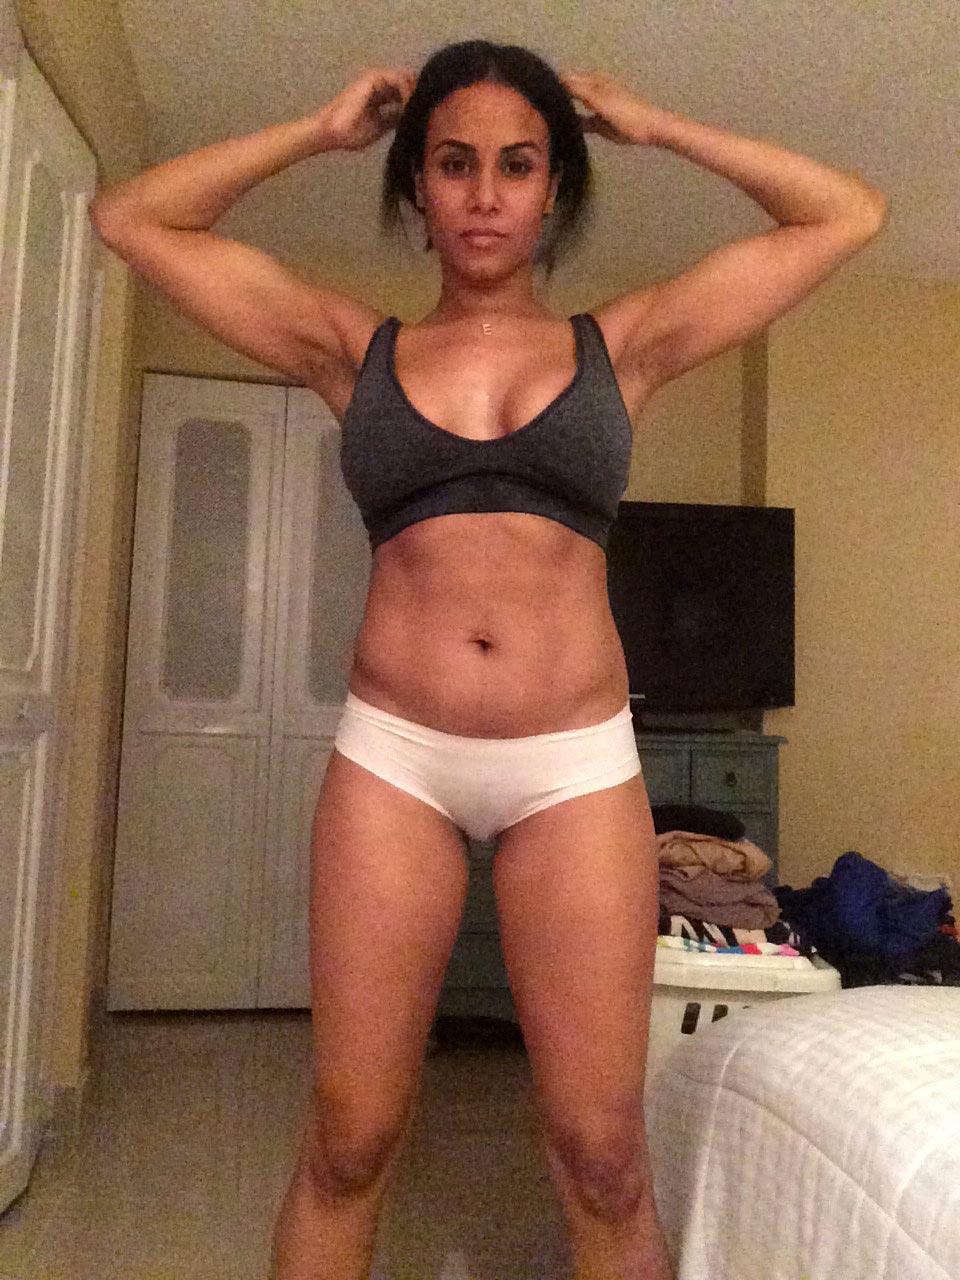 Emmaly Lugo Nude naked (12 pics)